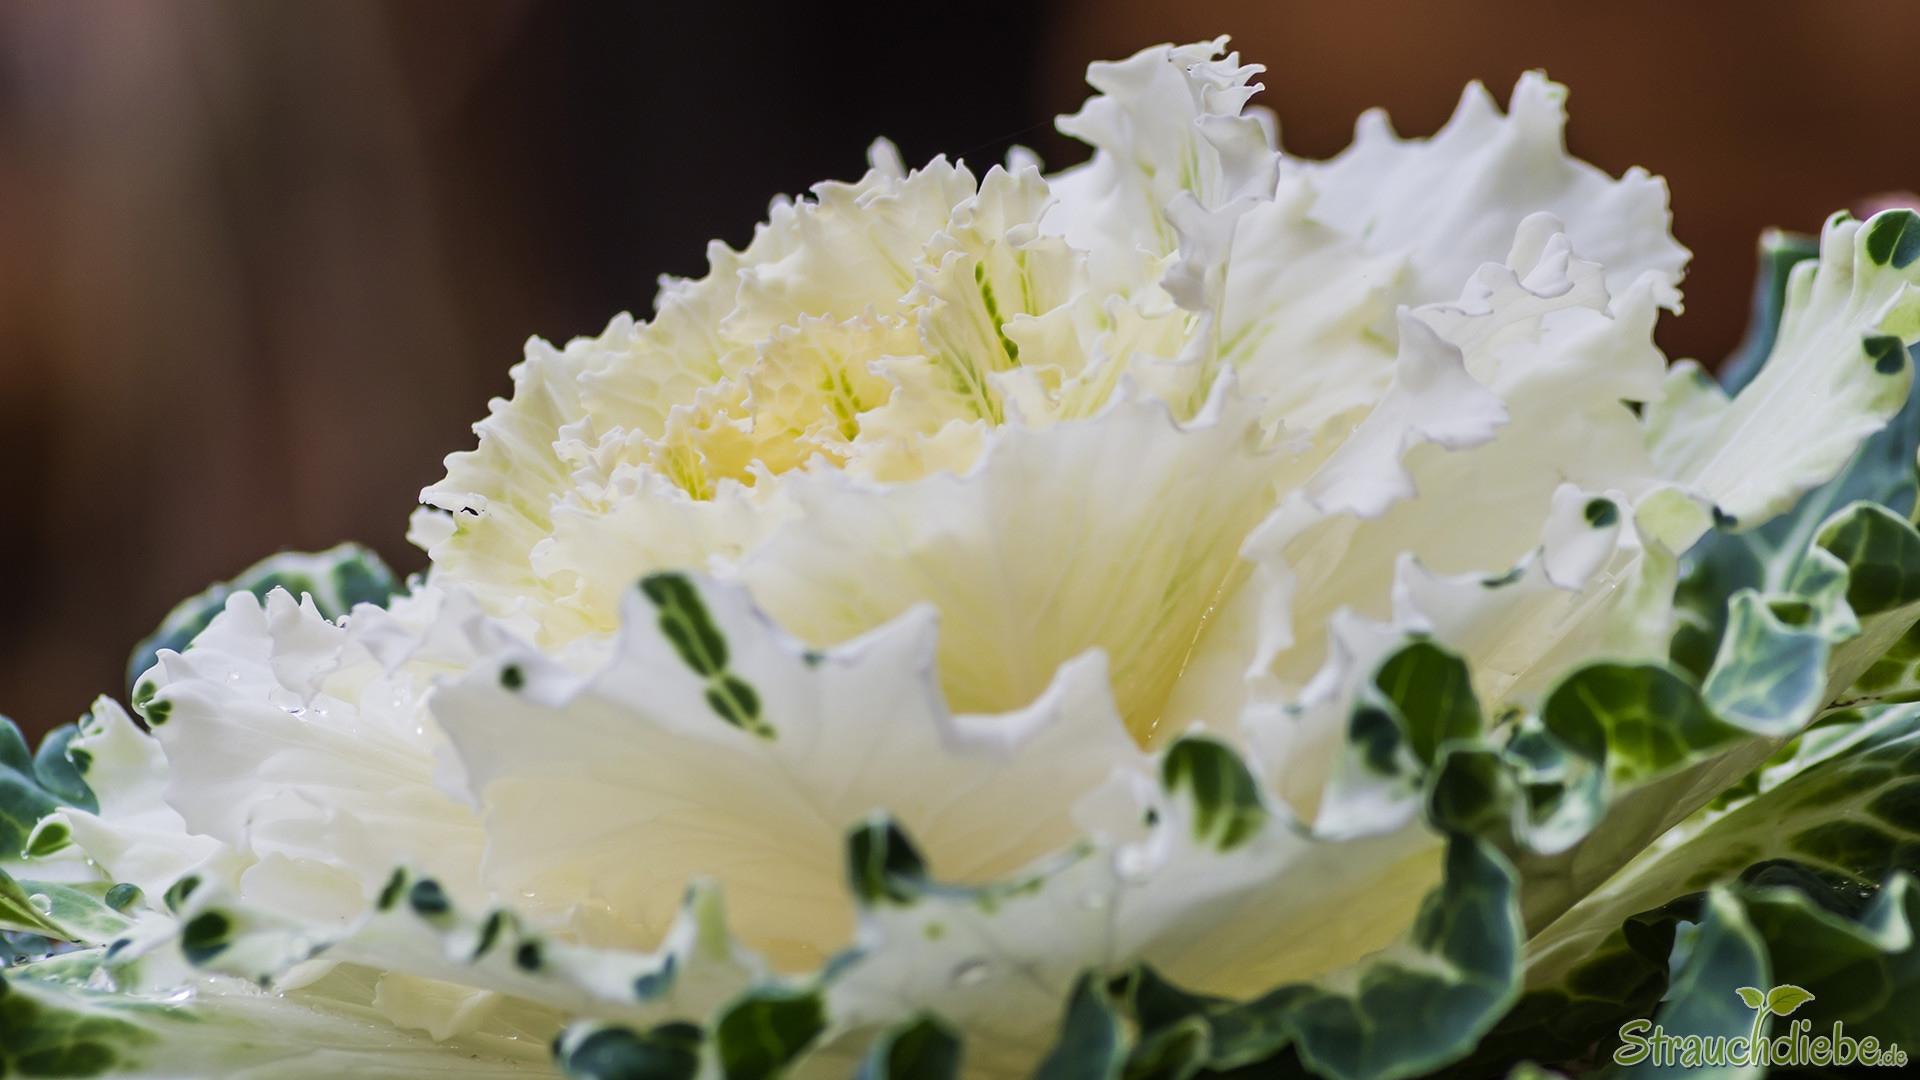 Zierkohl (Brassica oleracea var. acephala)